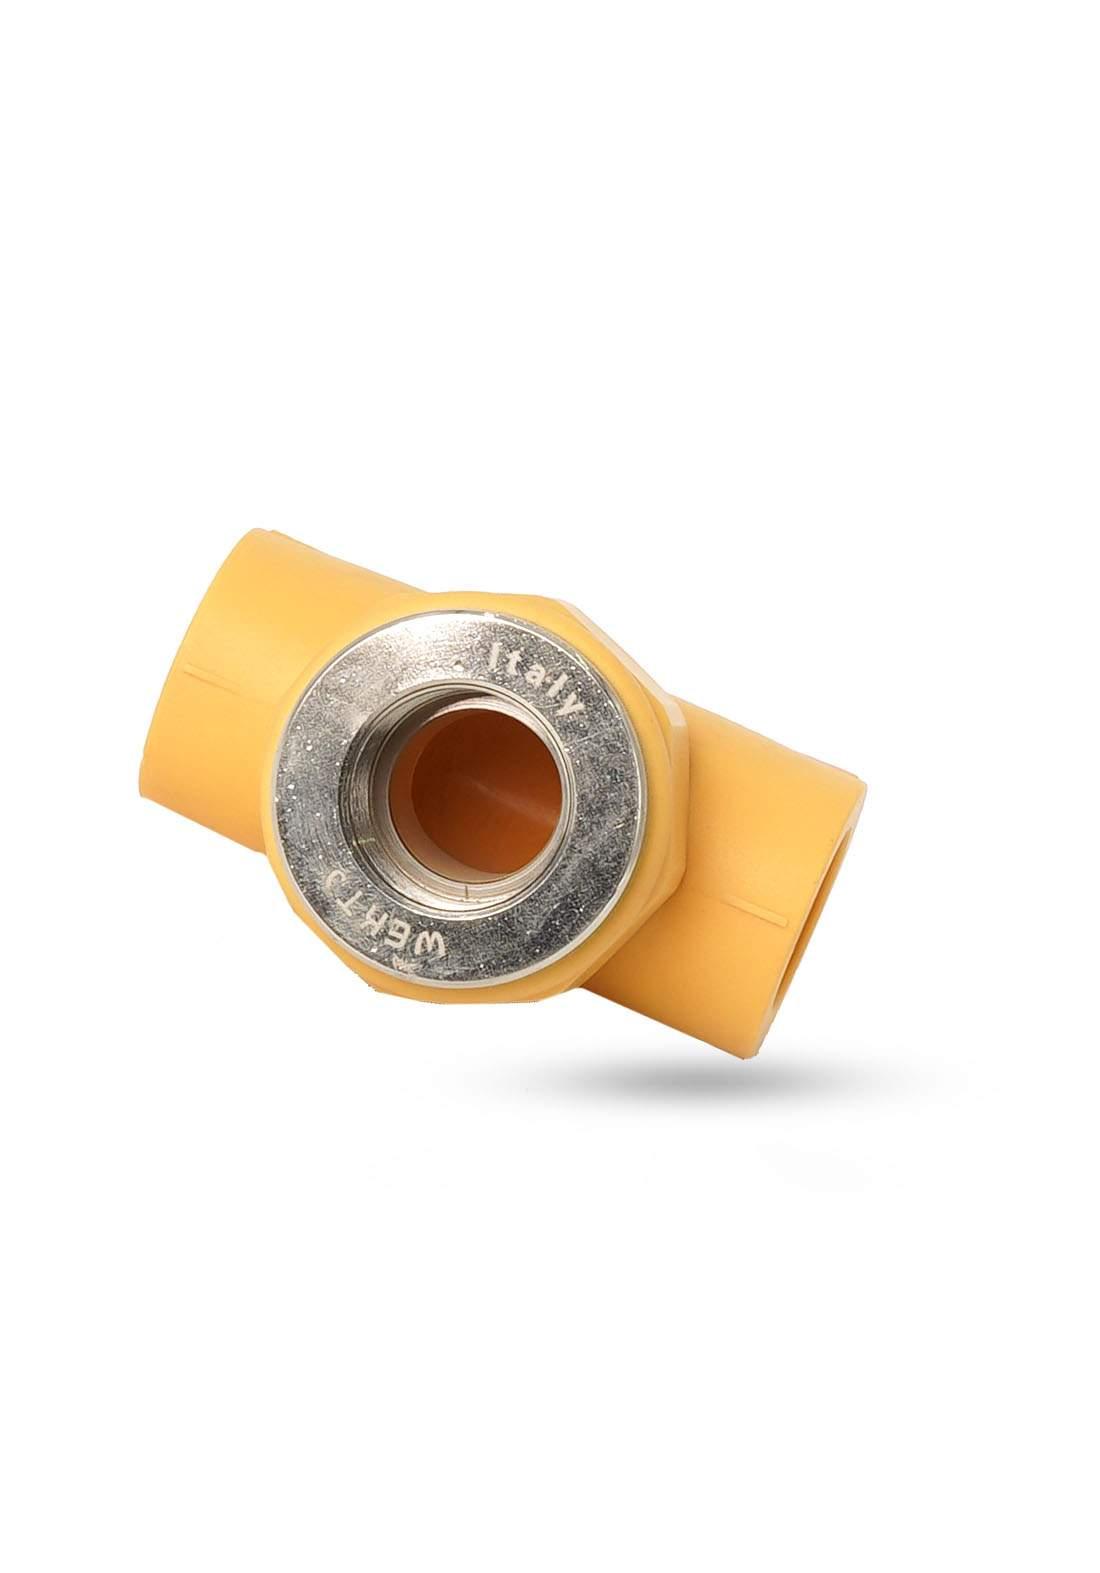 "Wekts 5281 Tooth Separator for water pipes 32  x 3/4"" تقسيم سن داخلي لأنابيب المياه"